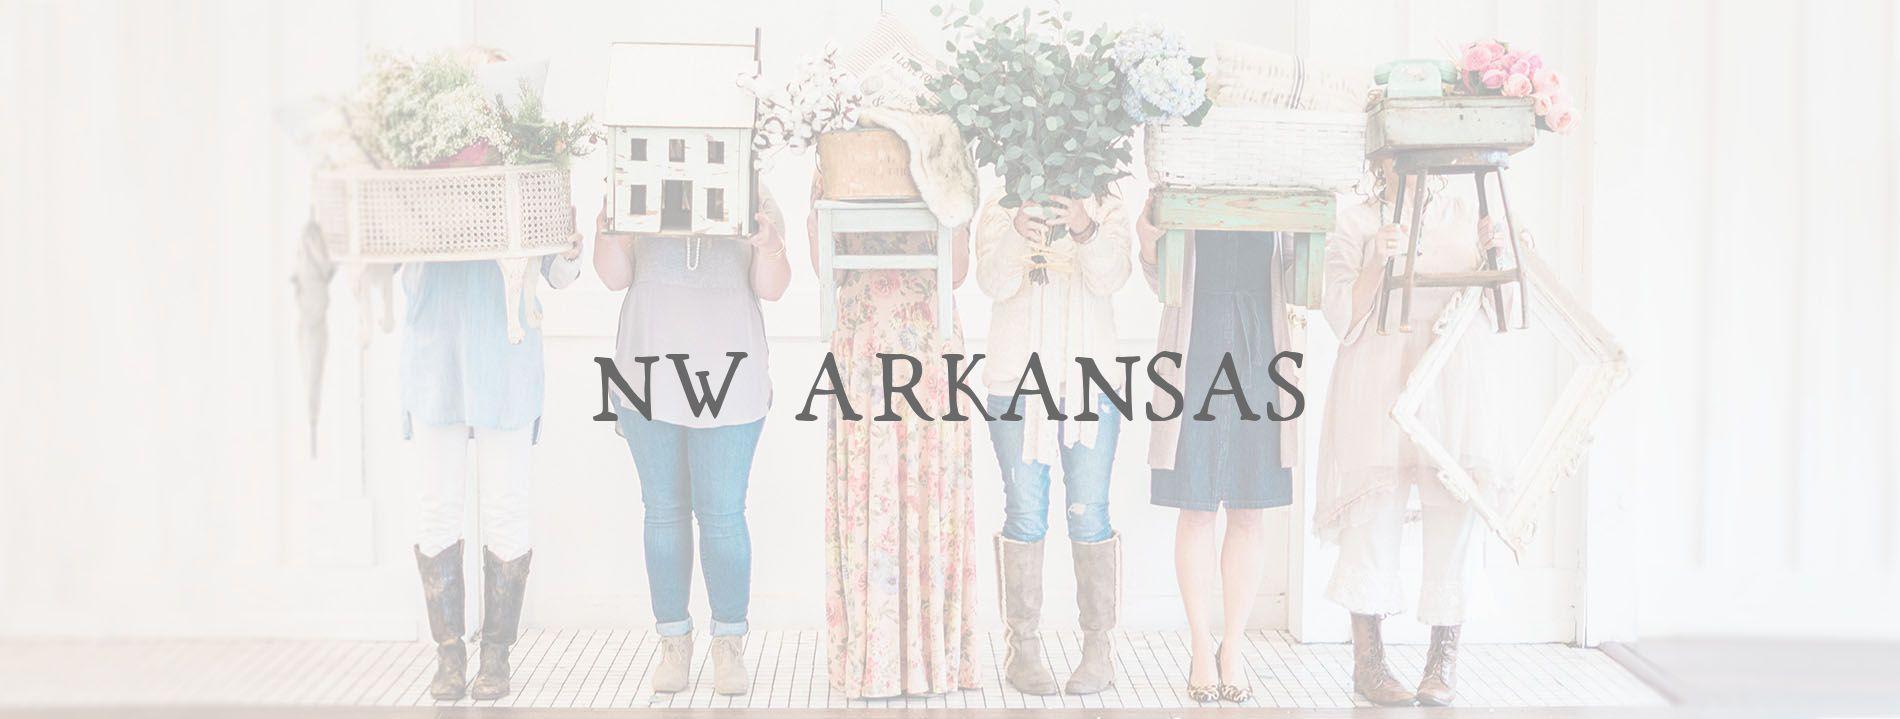 NW Arkansas